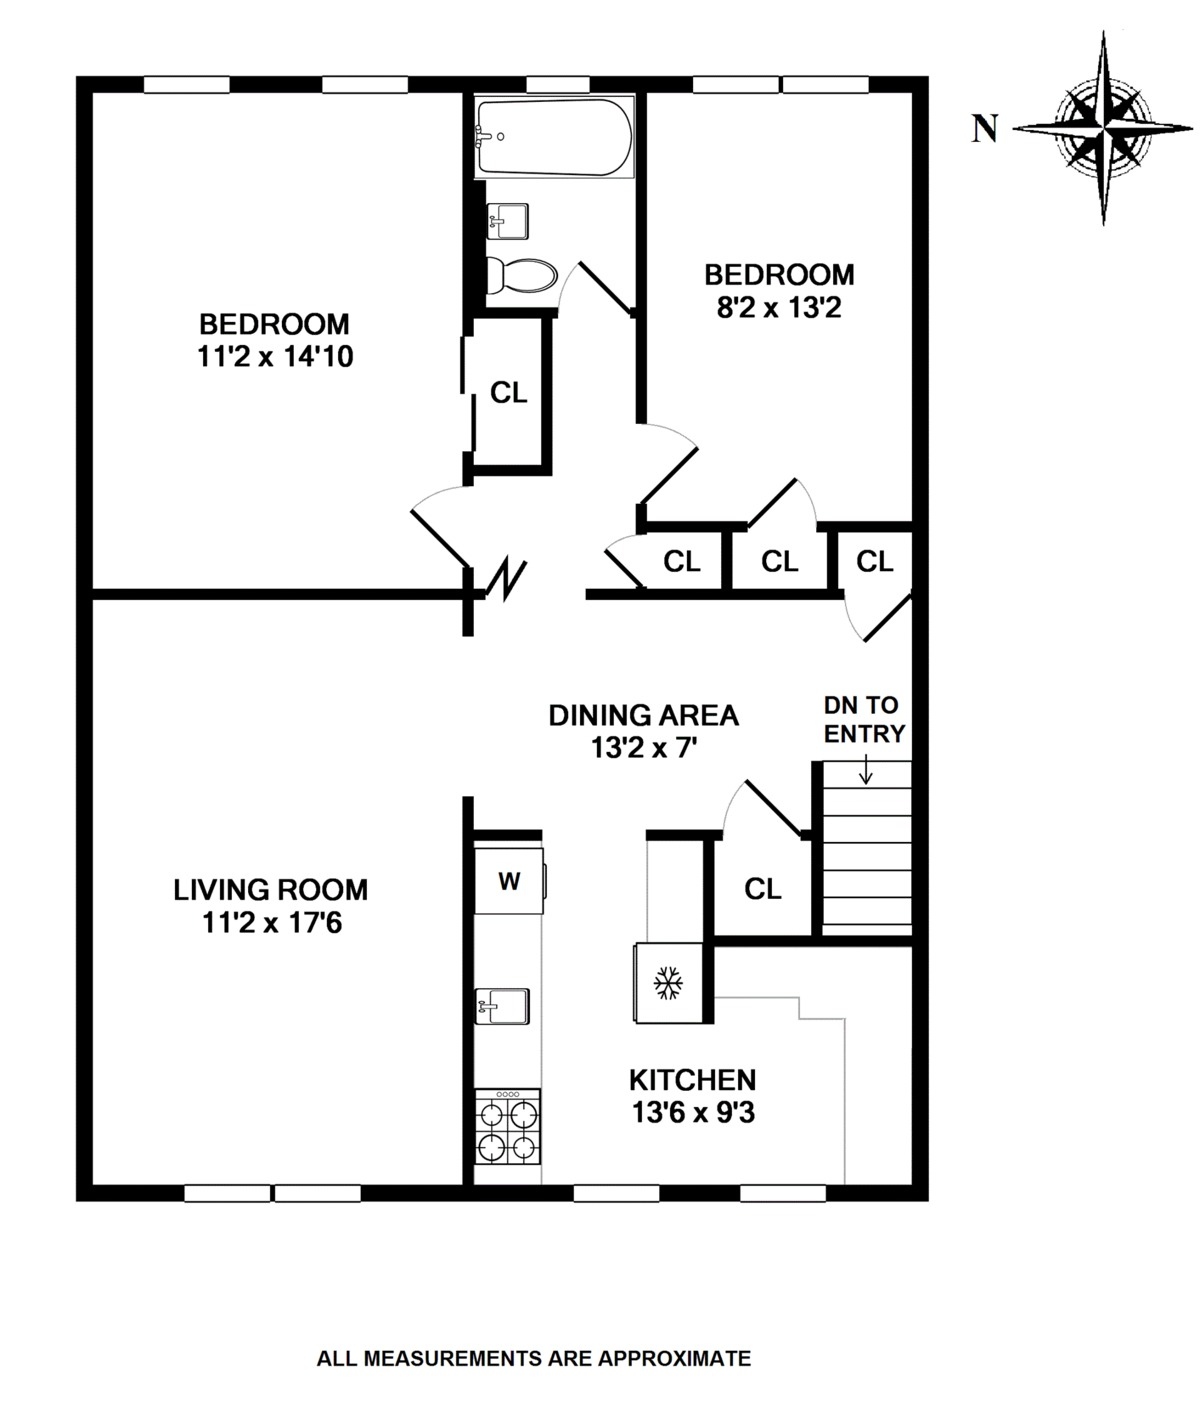 Fillmore Garden Apartments: StreetEasy: 2033 Pearson Street In Old Mill Basin, #2